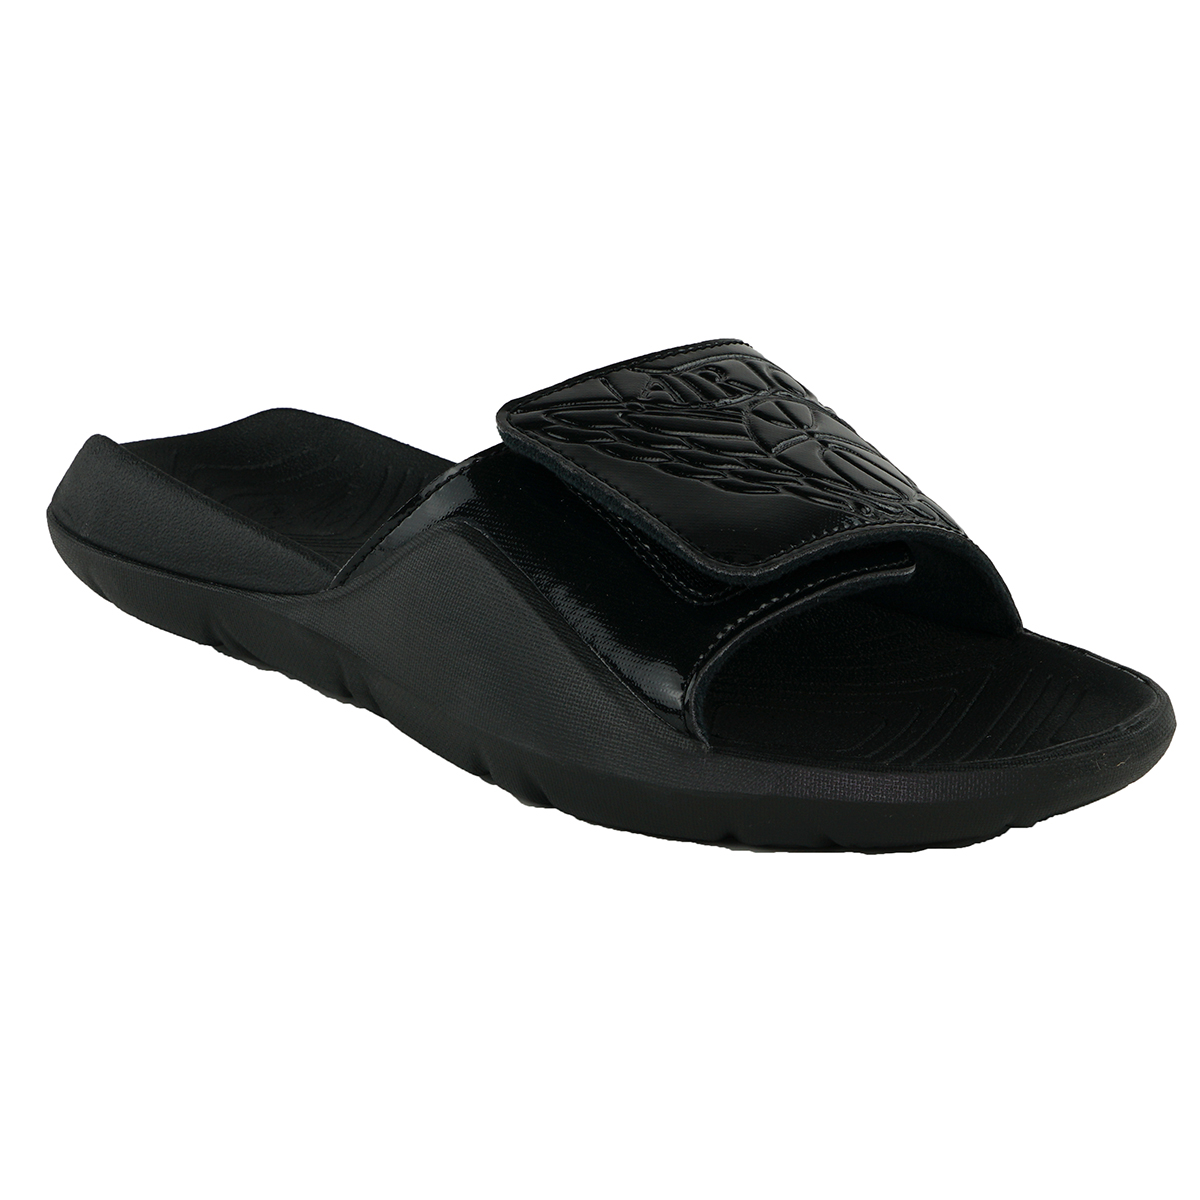 detailing 55777 04d86 Air Jordan Men s Hydro 7 Slide Sandals   Color Black Black